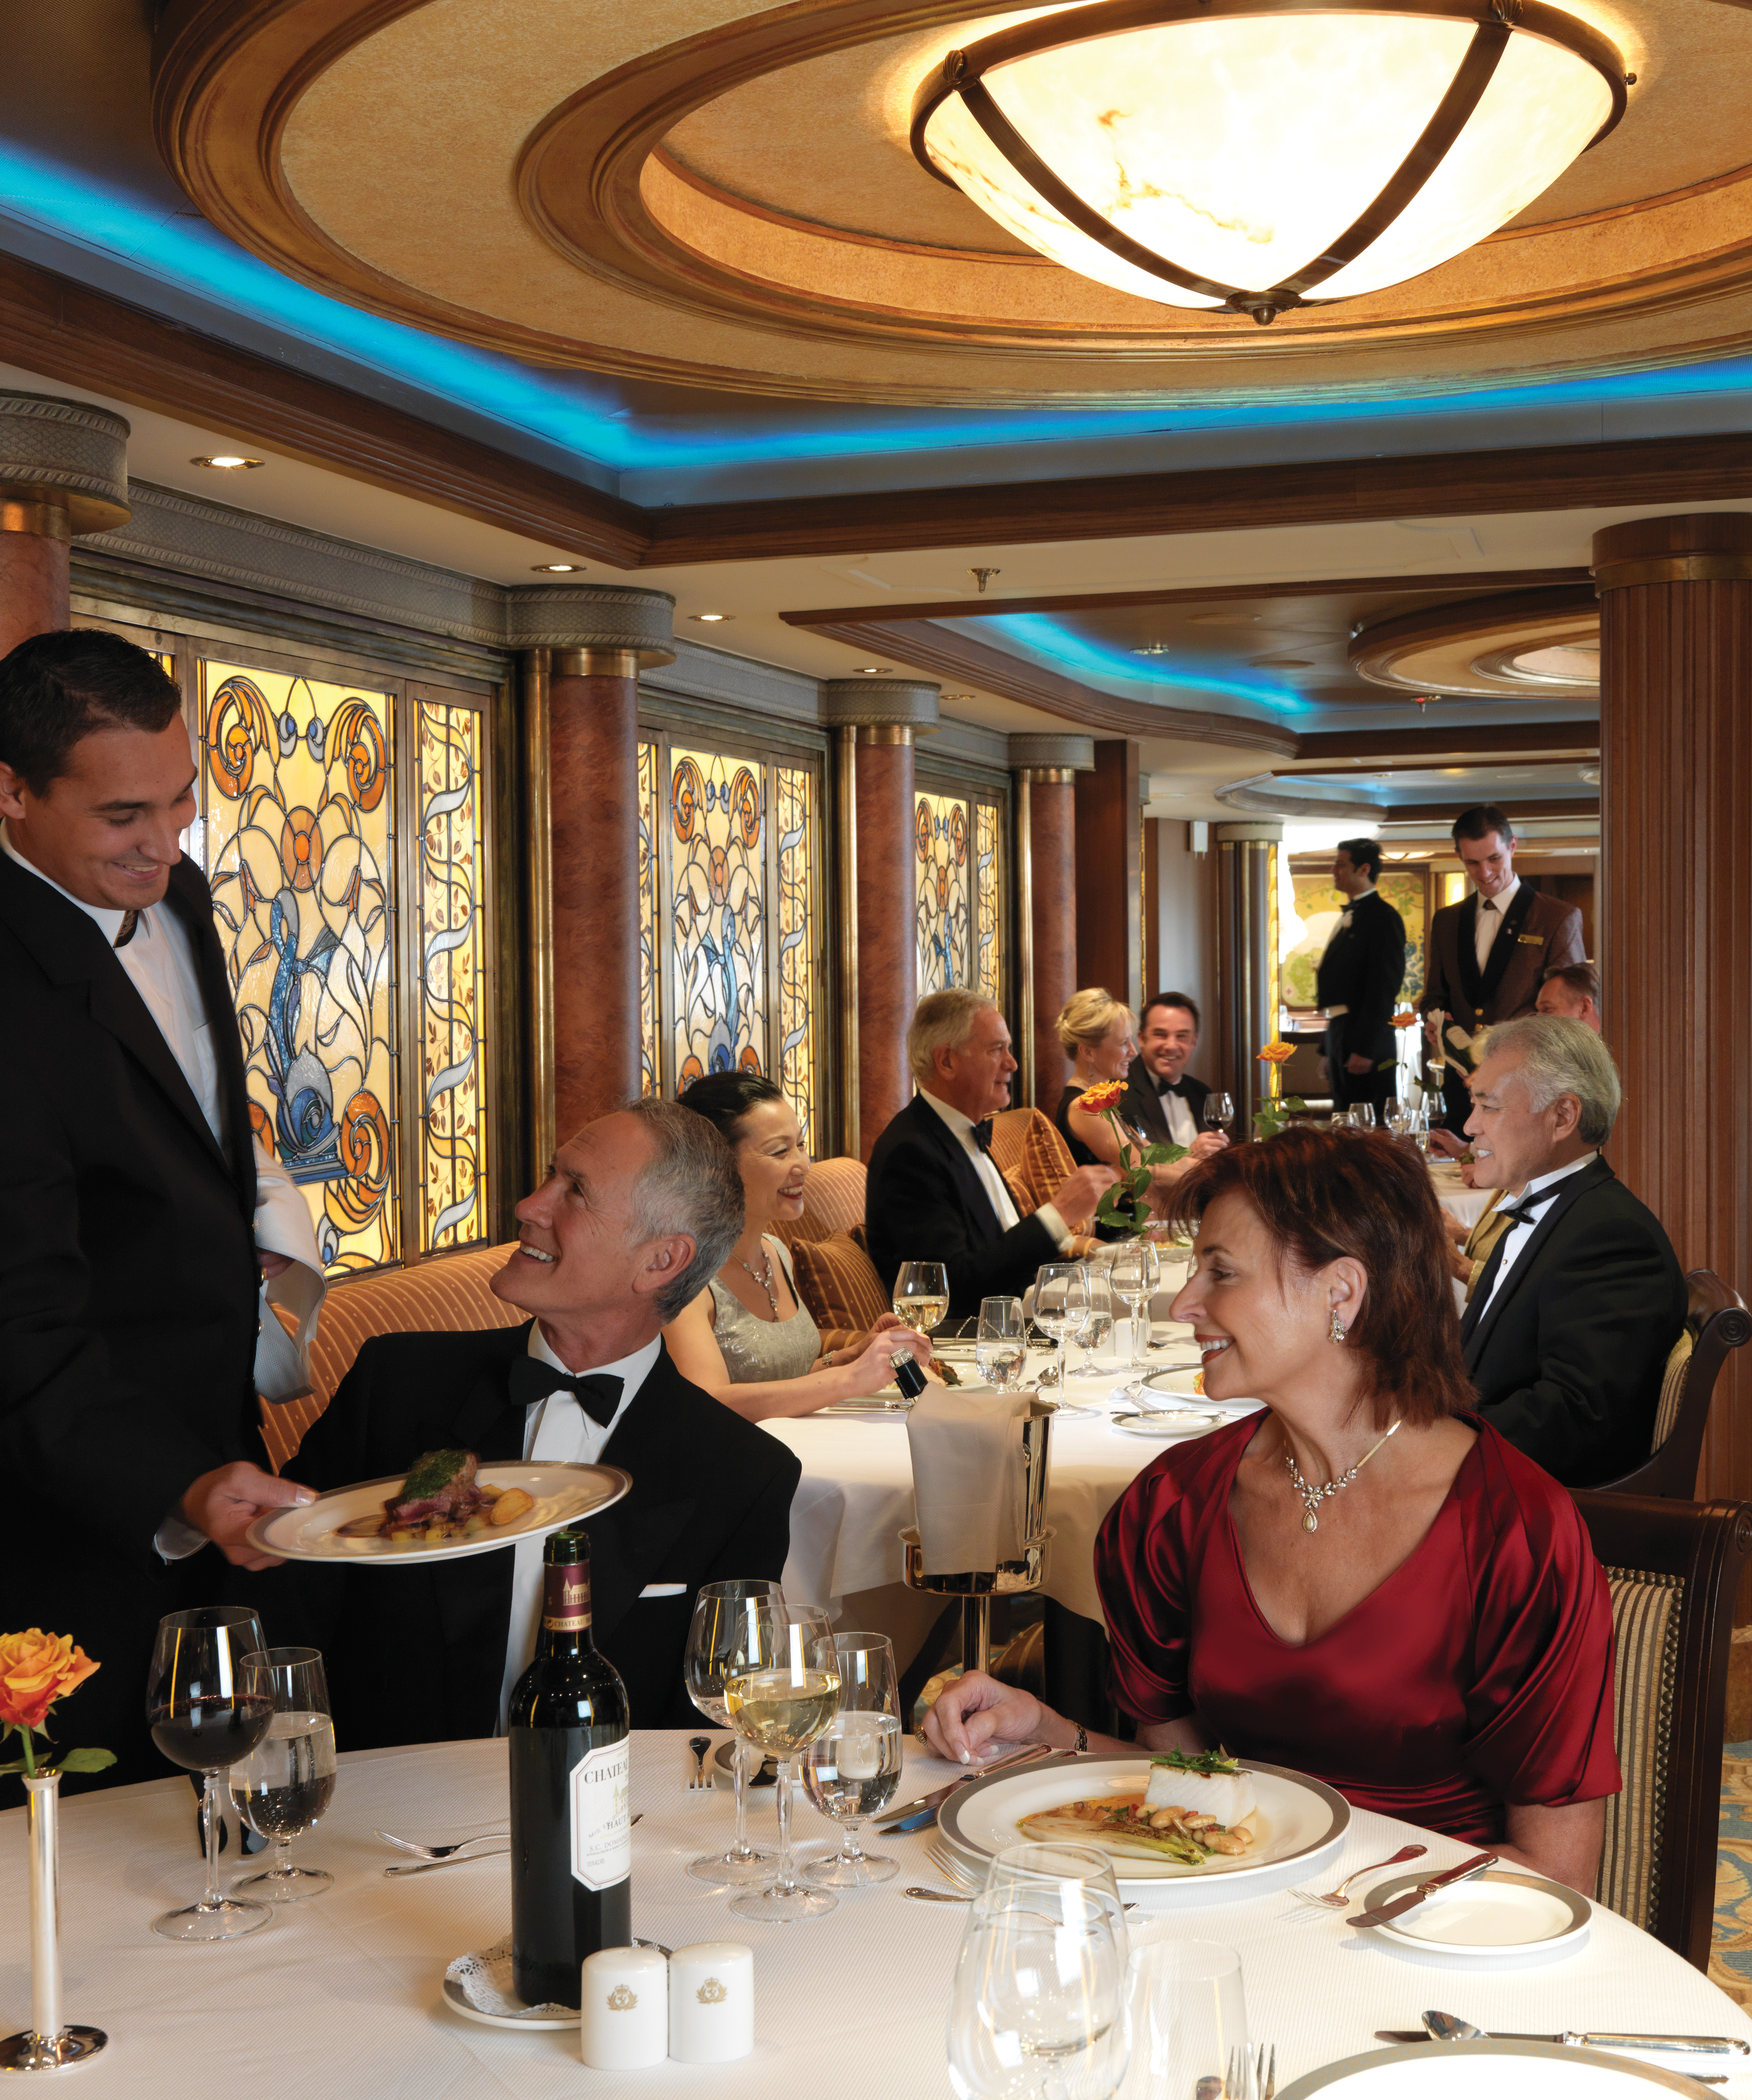 Cunard Line Queen Victoria Queens Grill Restaurant 1.JPG